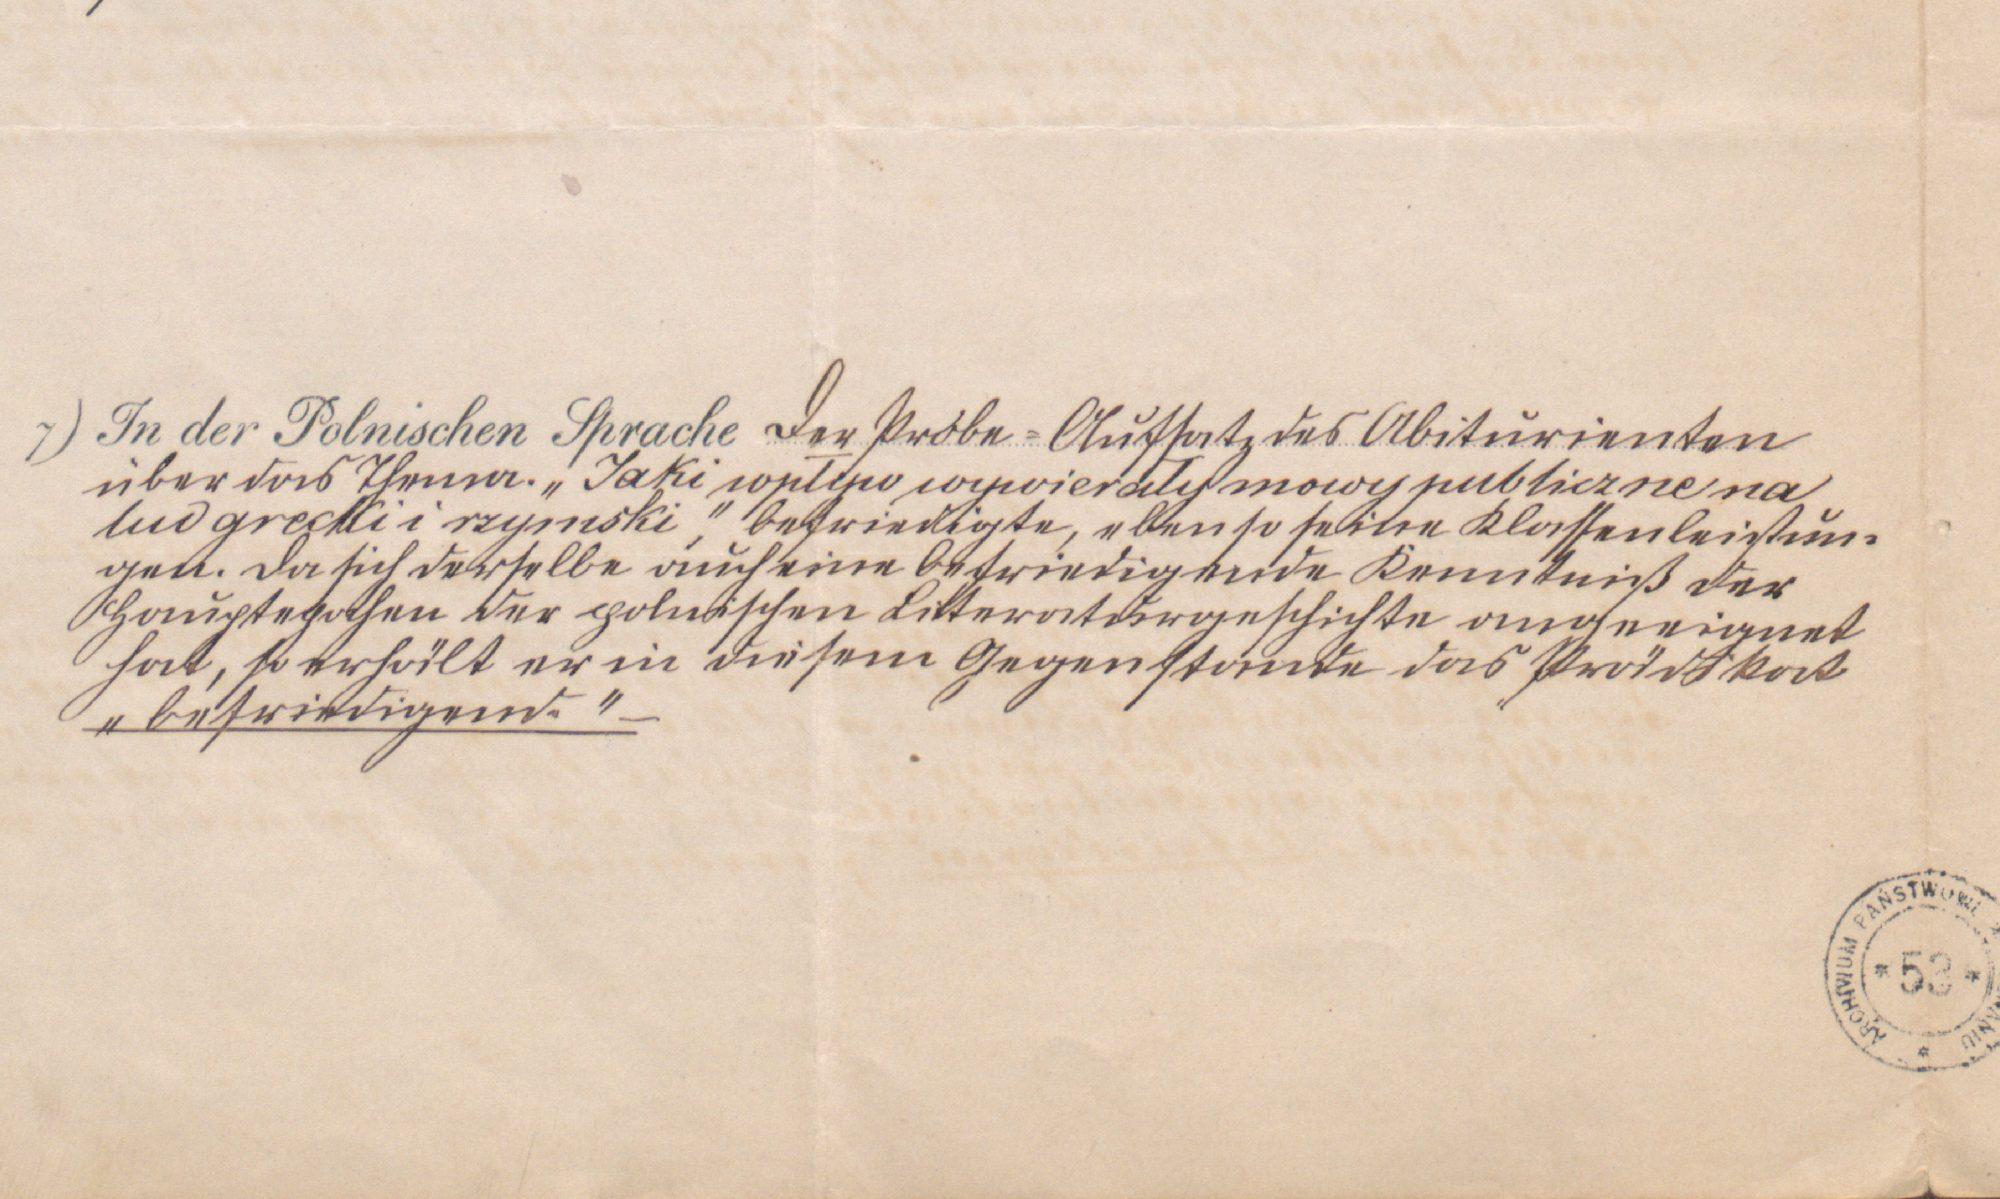 Dawne pismo niemieckie